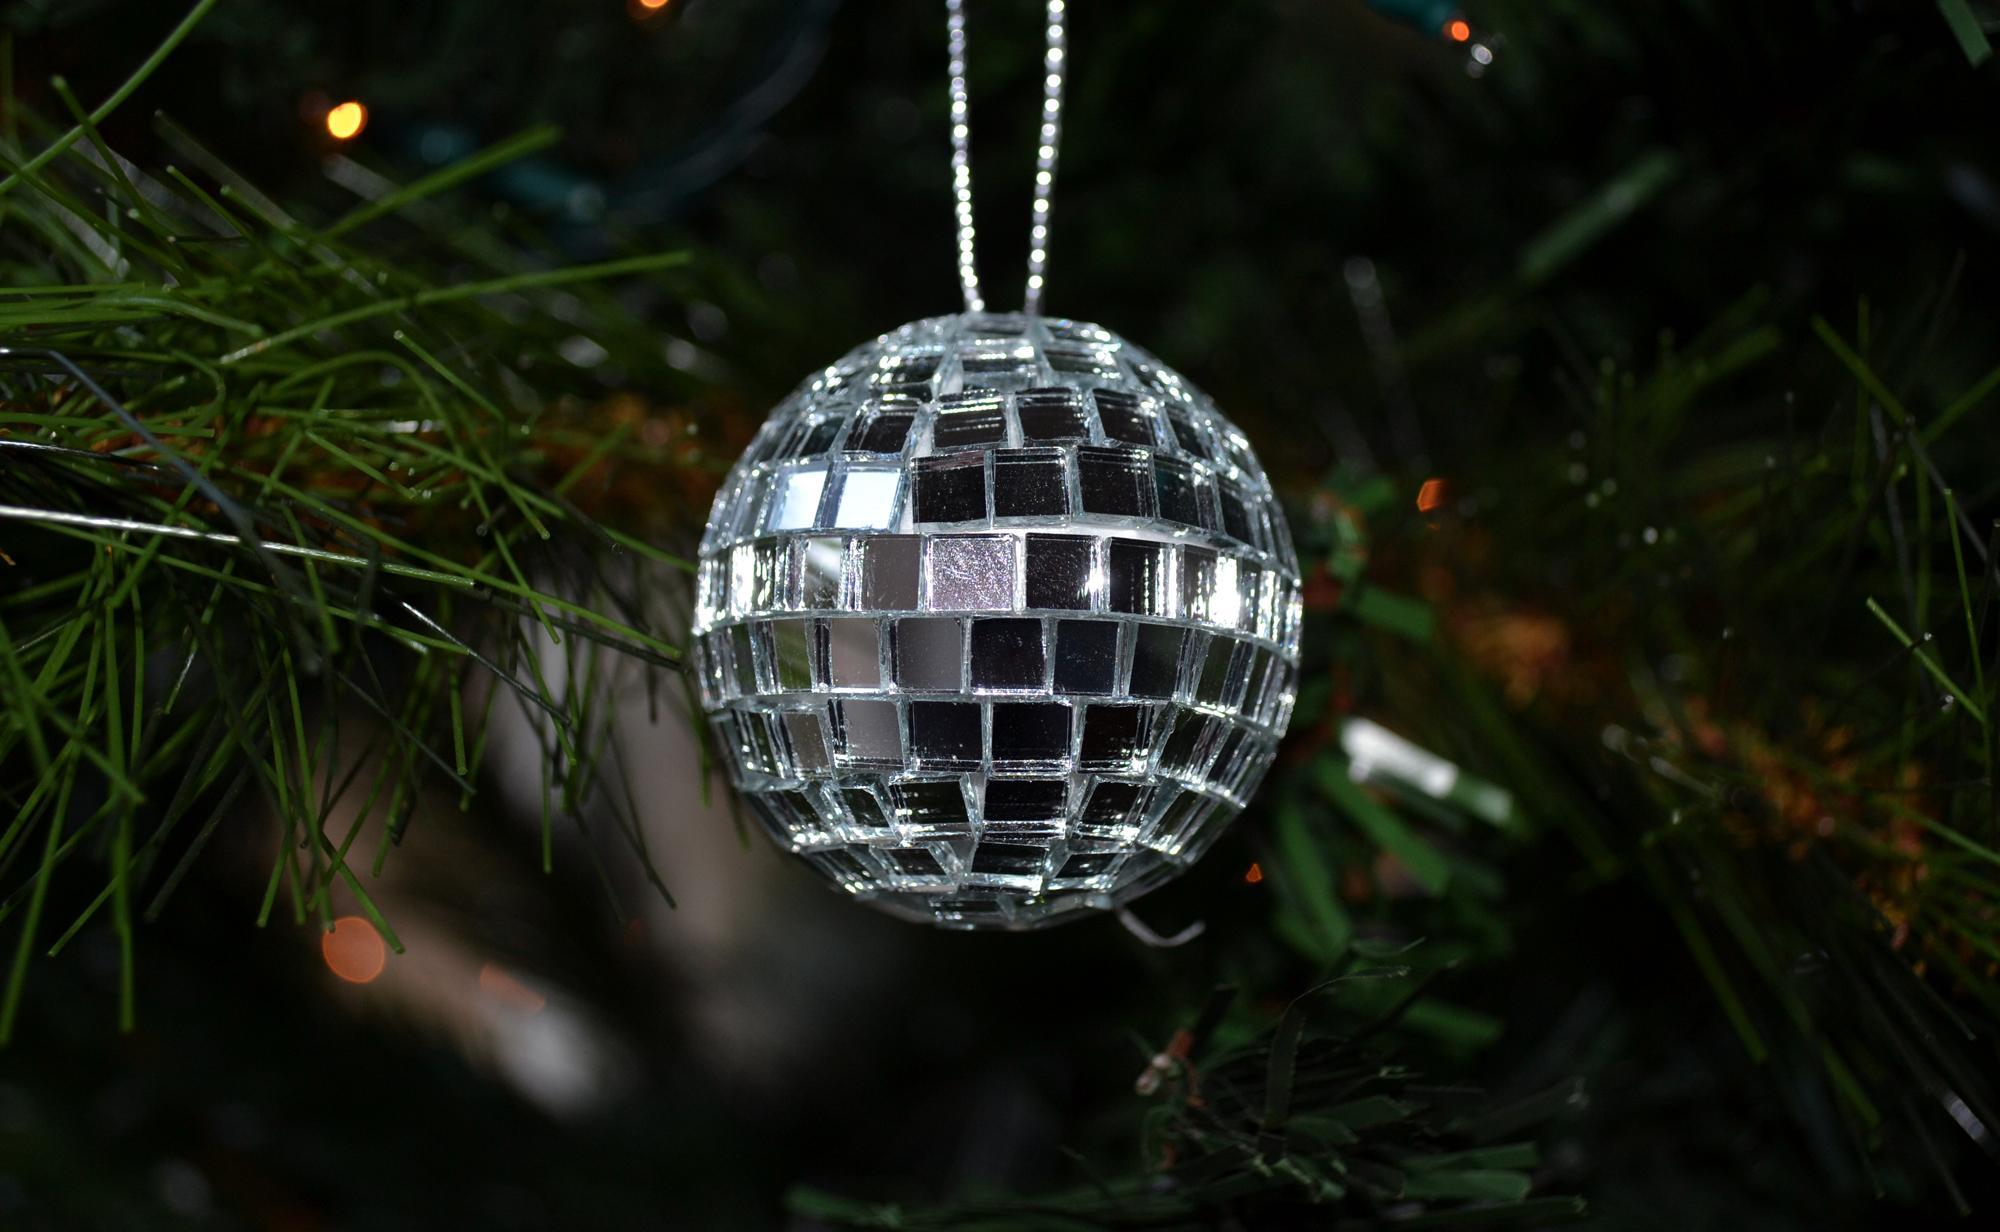 Happy Christmas from Splodz Blogz